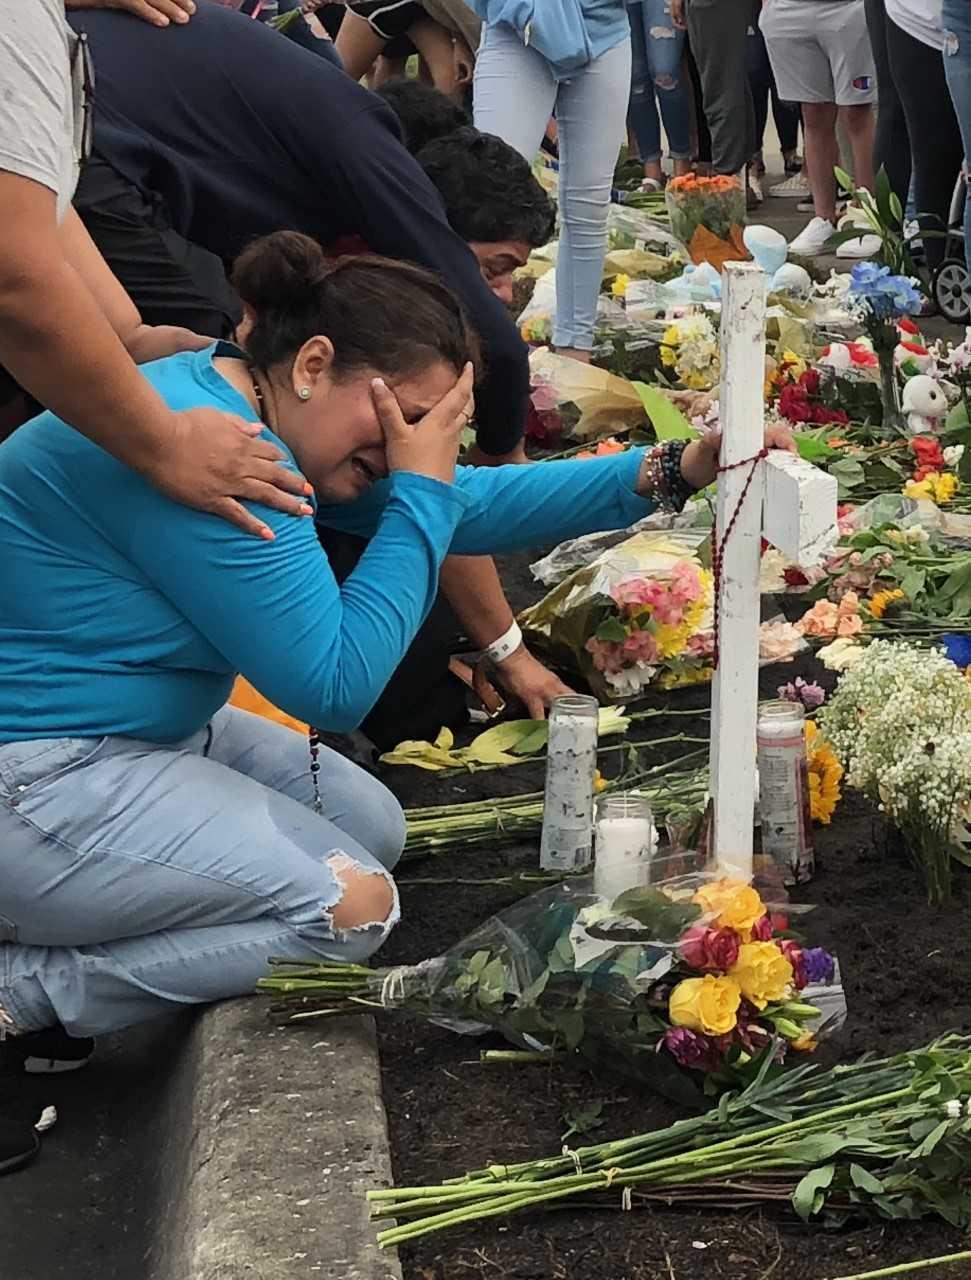 Hundreds gather in Sarasota to mourn 3 teens killed in crash